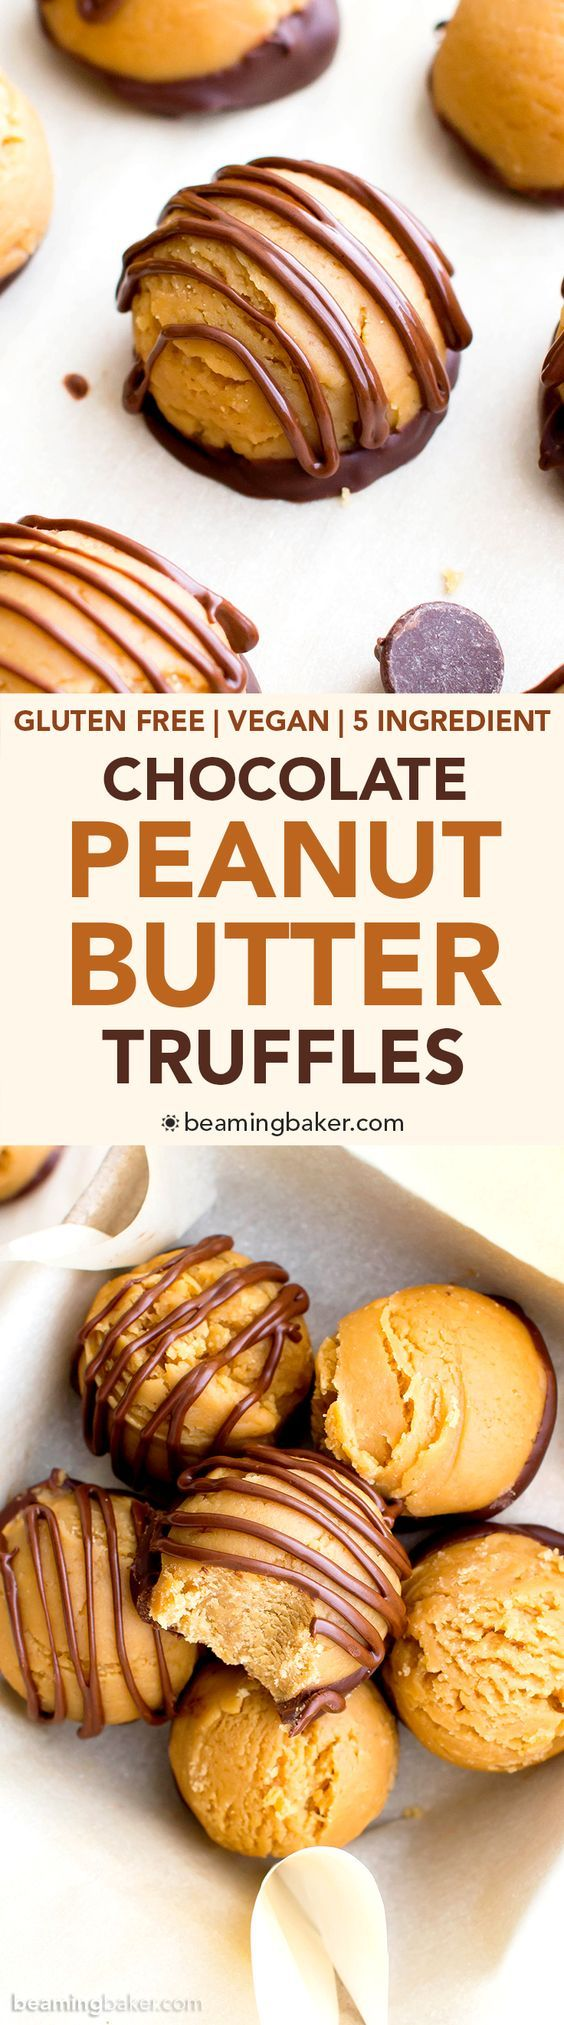 Gluten Free Vegan Chocolate Peanut Butter Truffles (V, GF, DF): an easy, 5 ingredient recipe for decadent peanut butter truffles dipped in chocolate. #Vegan #GlutenFree #DairyFree #Christmas | BeamingBaker.com